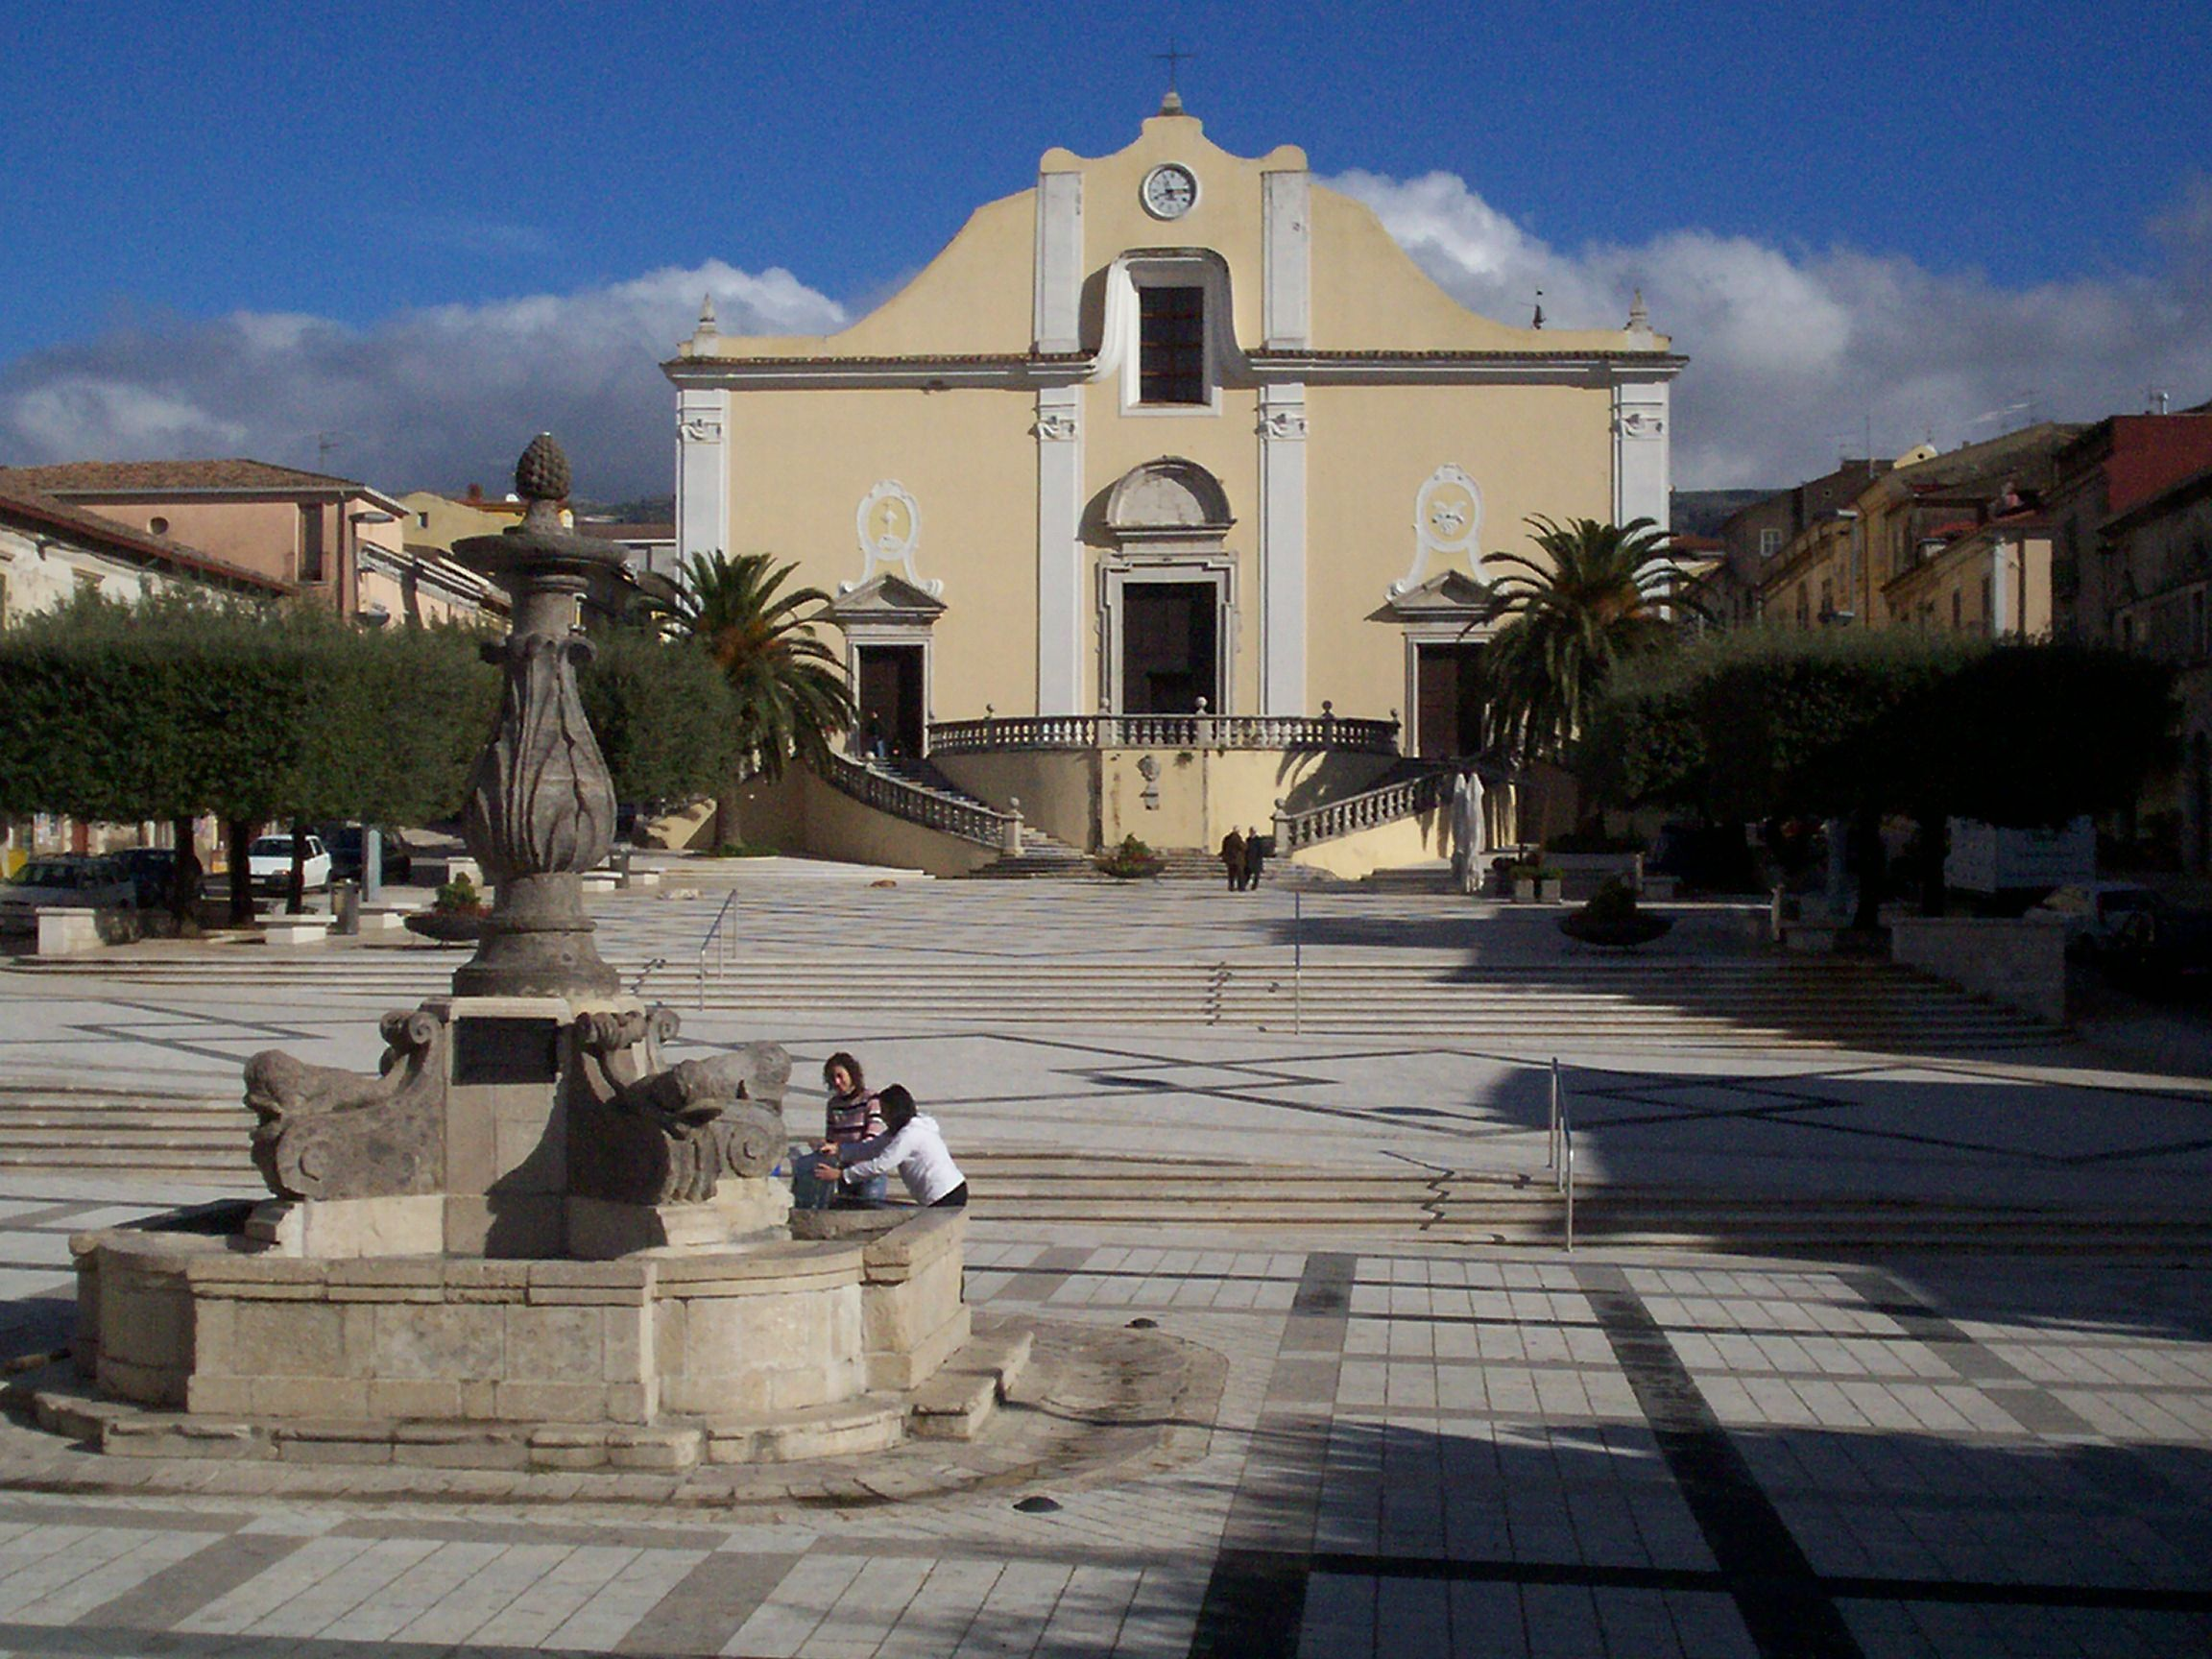 Piazza_San_Martino_-_Cerreto_Sannita.JPG (2304×1728)